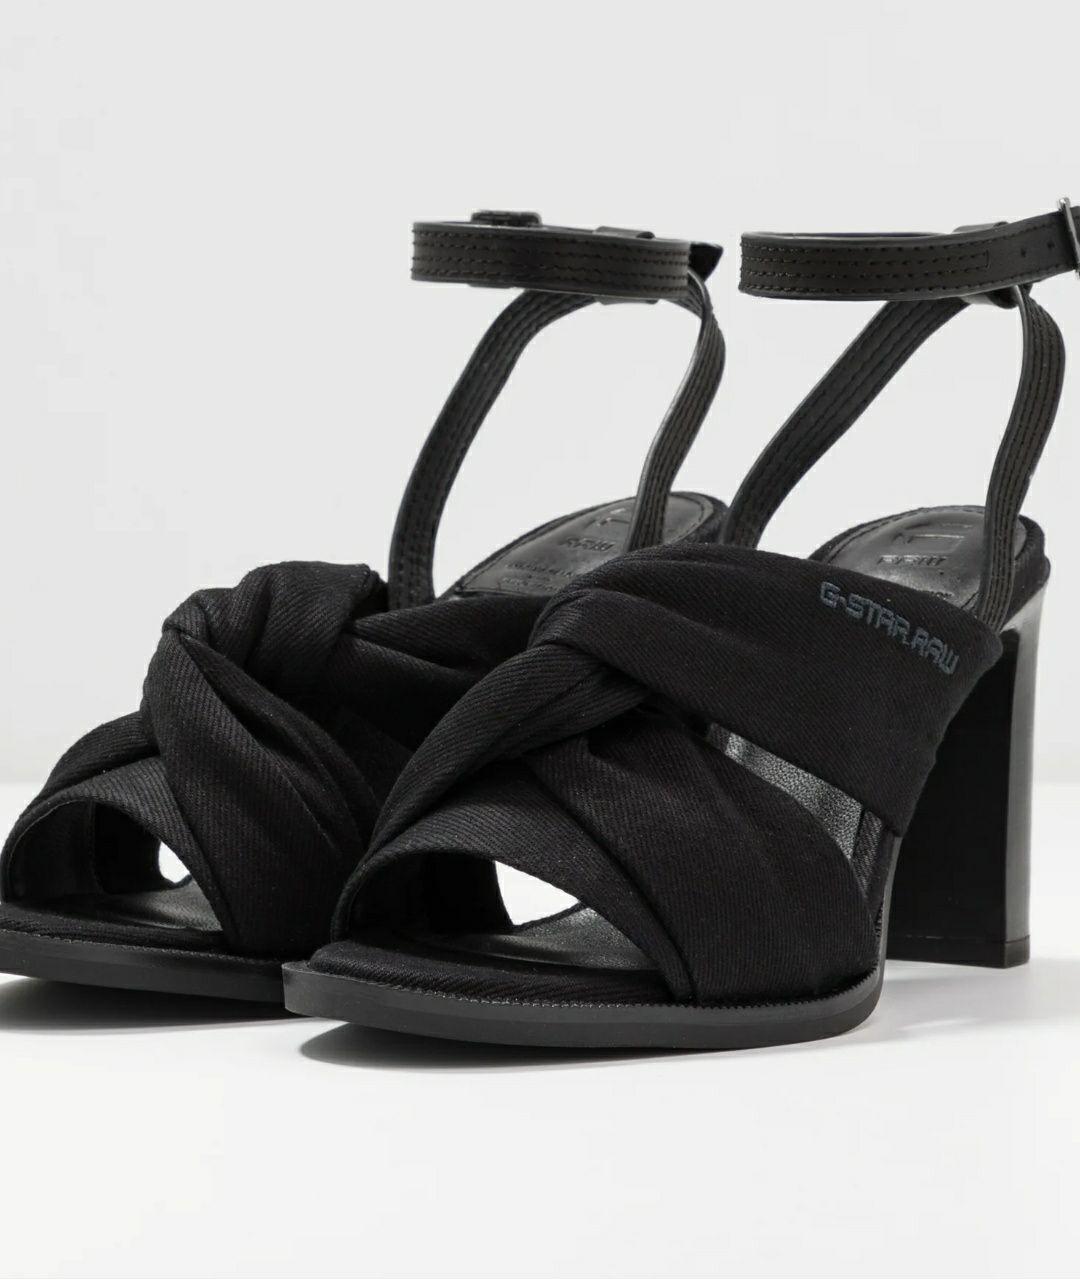 G-STAR RAW Knot-Marina Dames Hoge hak sandalen